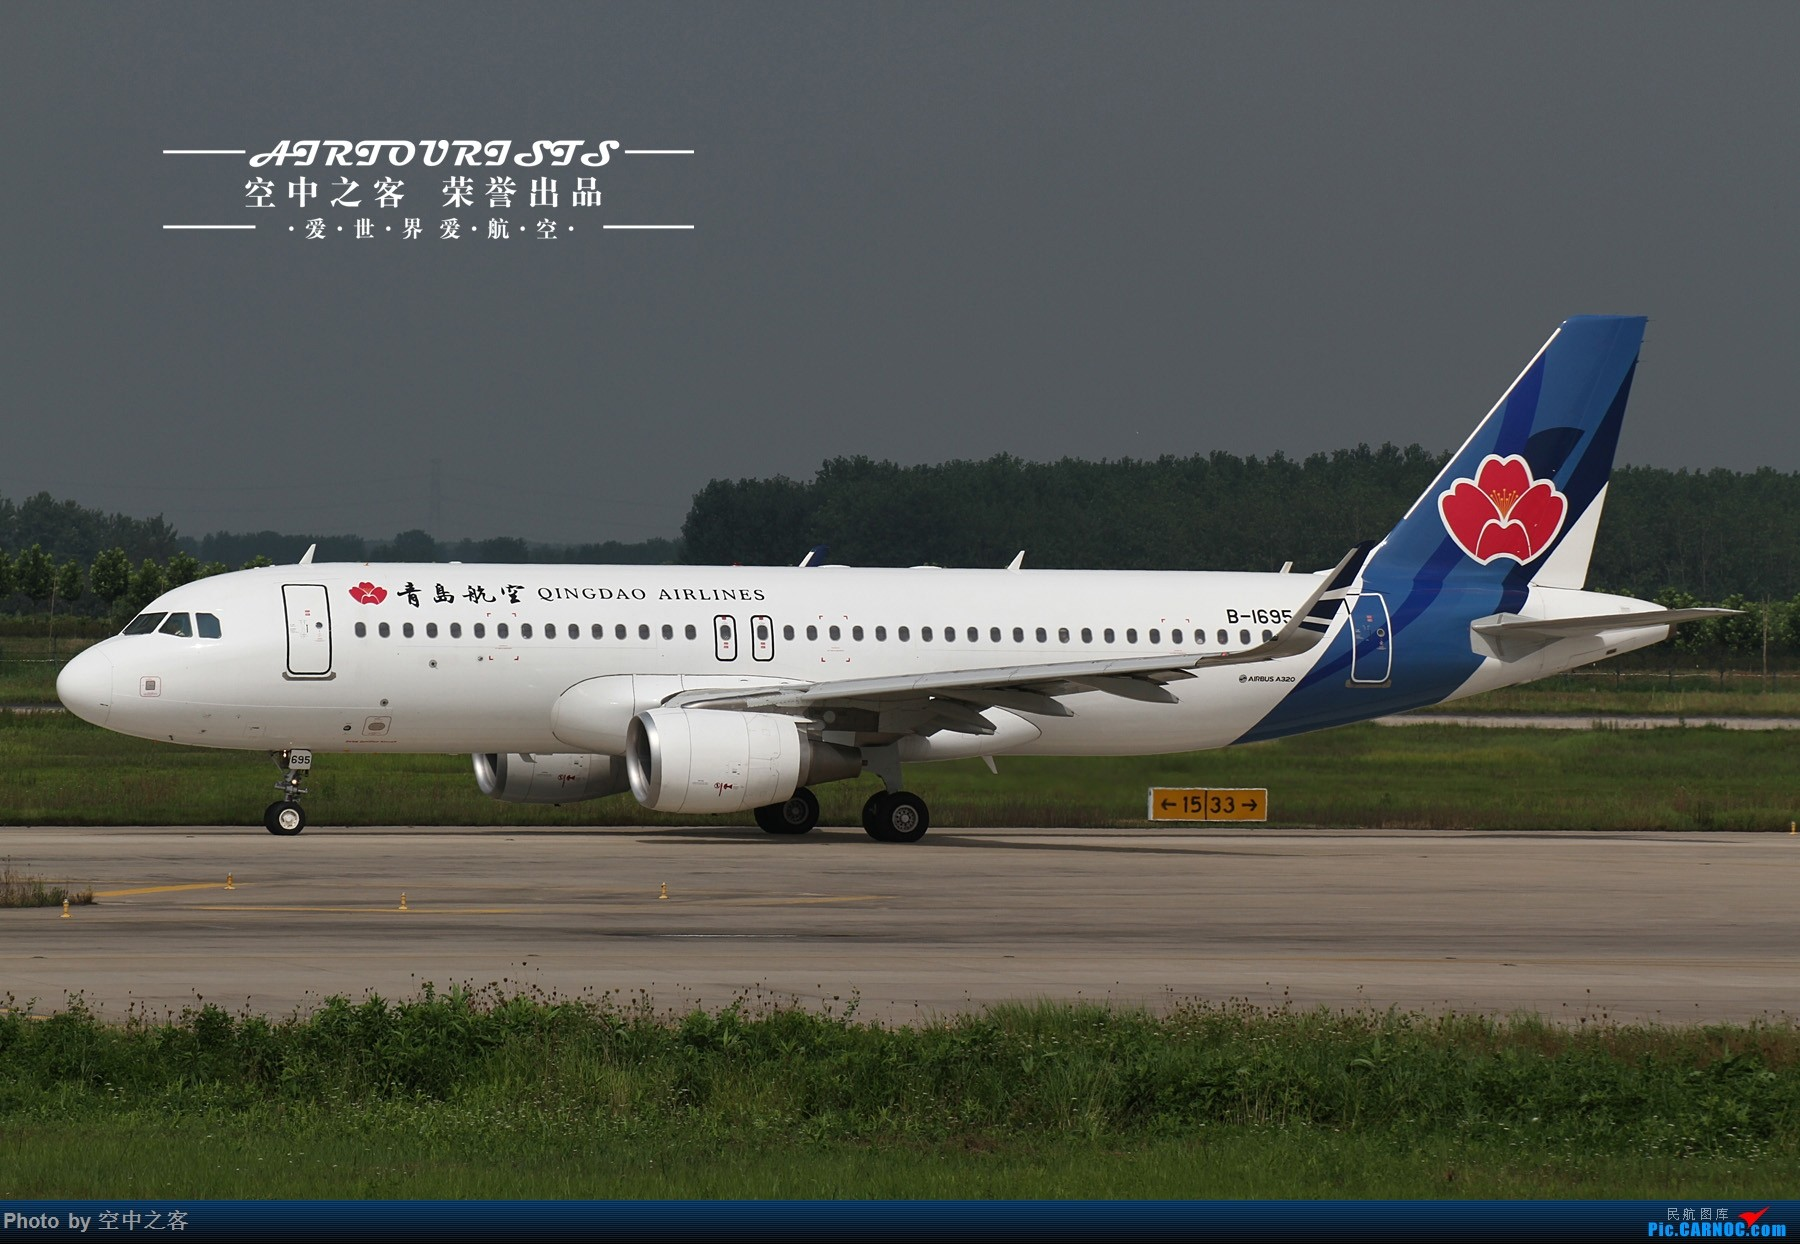 Re:[原创][合肥飞友会·霸都打机队 空中之客出品]桥机场的新飞机和一如既往的电风扇(2) AIRBUS A320-200 B-1695 合肥新桥国际机场